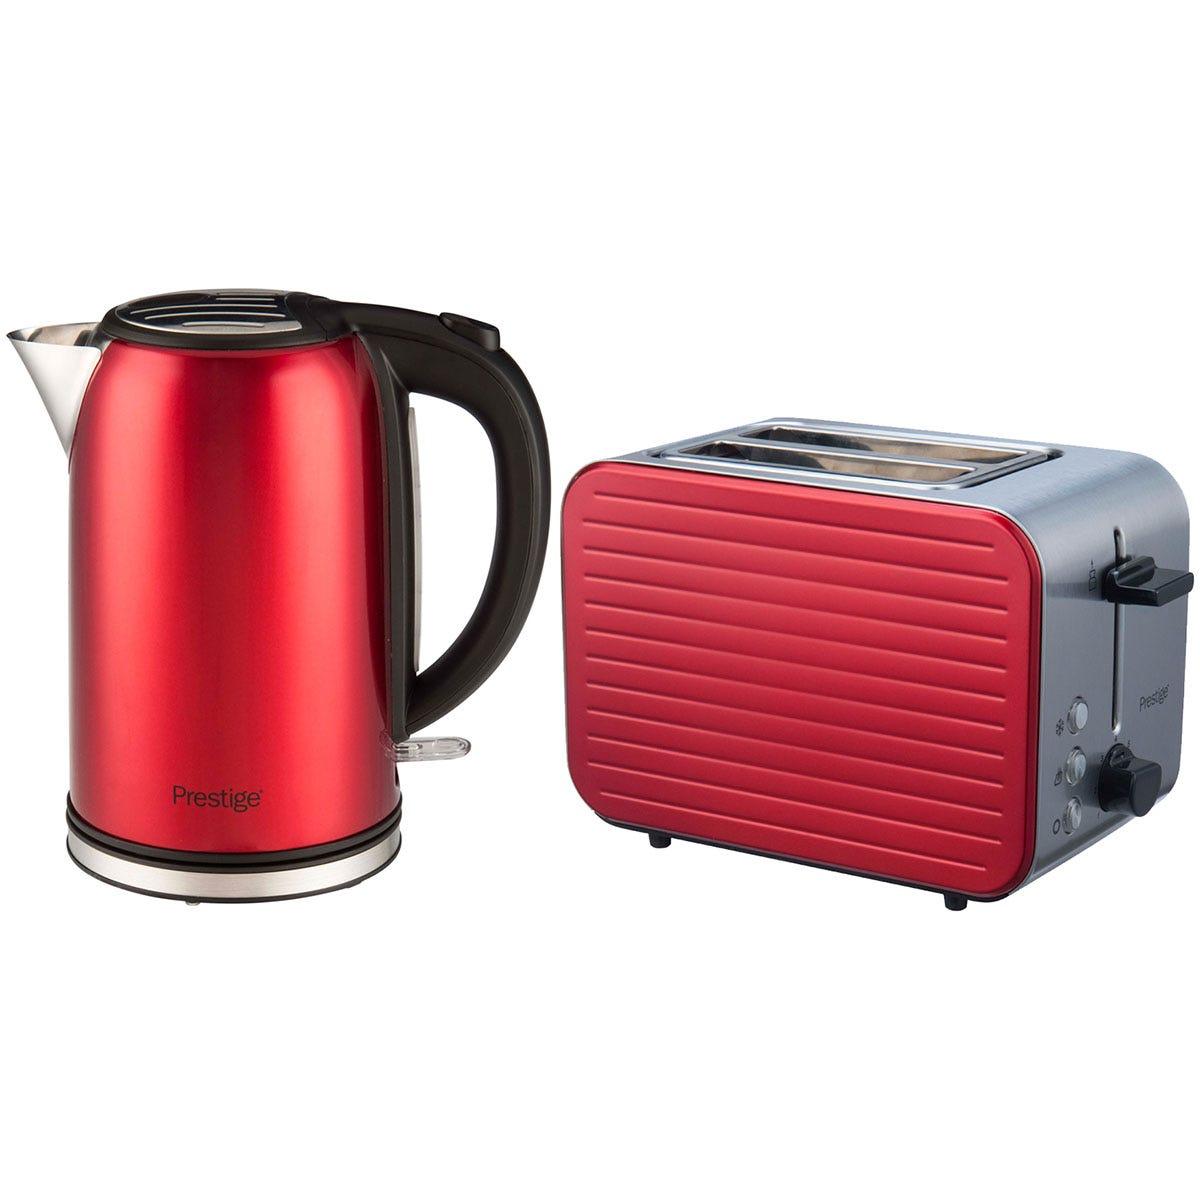 Prestige 61227 Pearlescent 1.7L Kettle and 2-Slice Toaster Set - Red